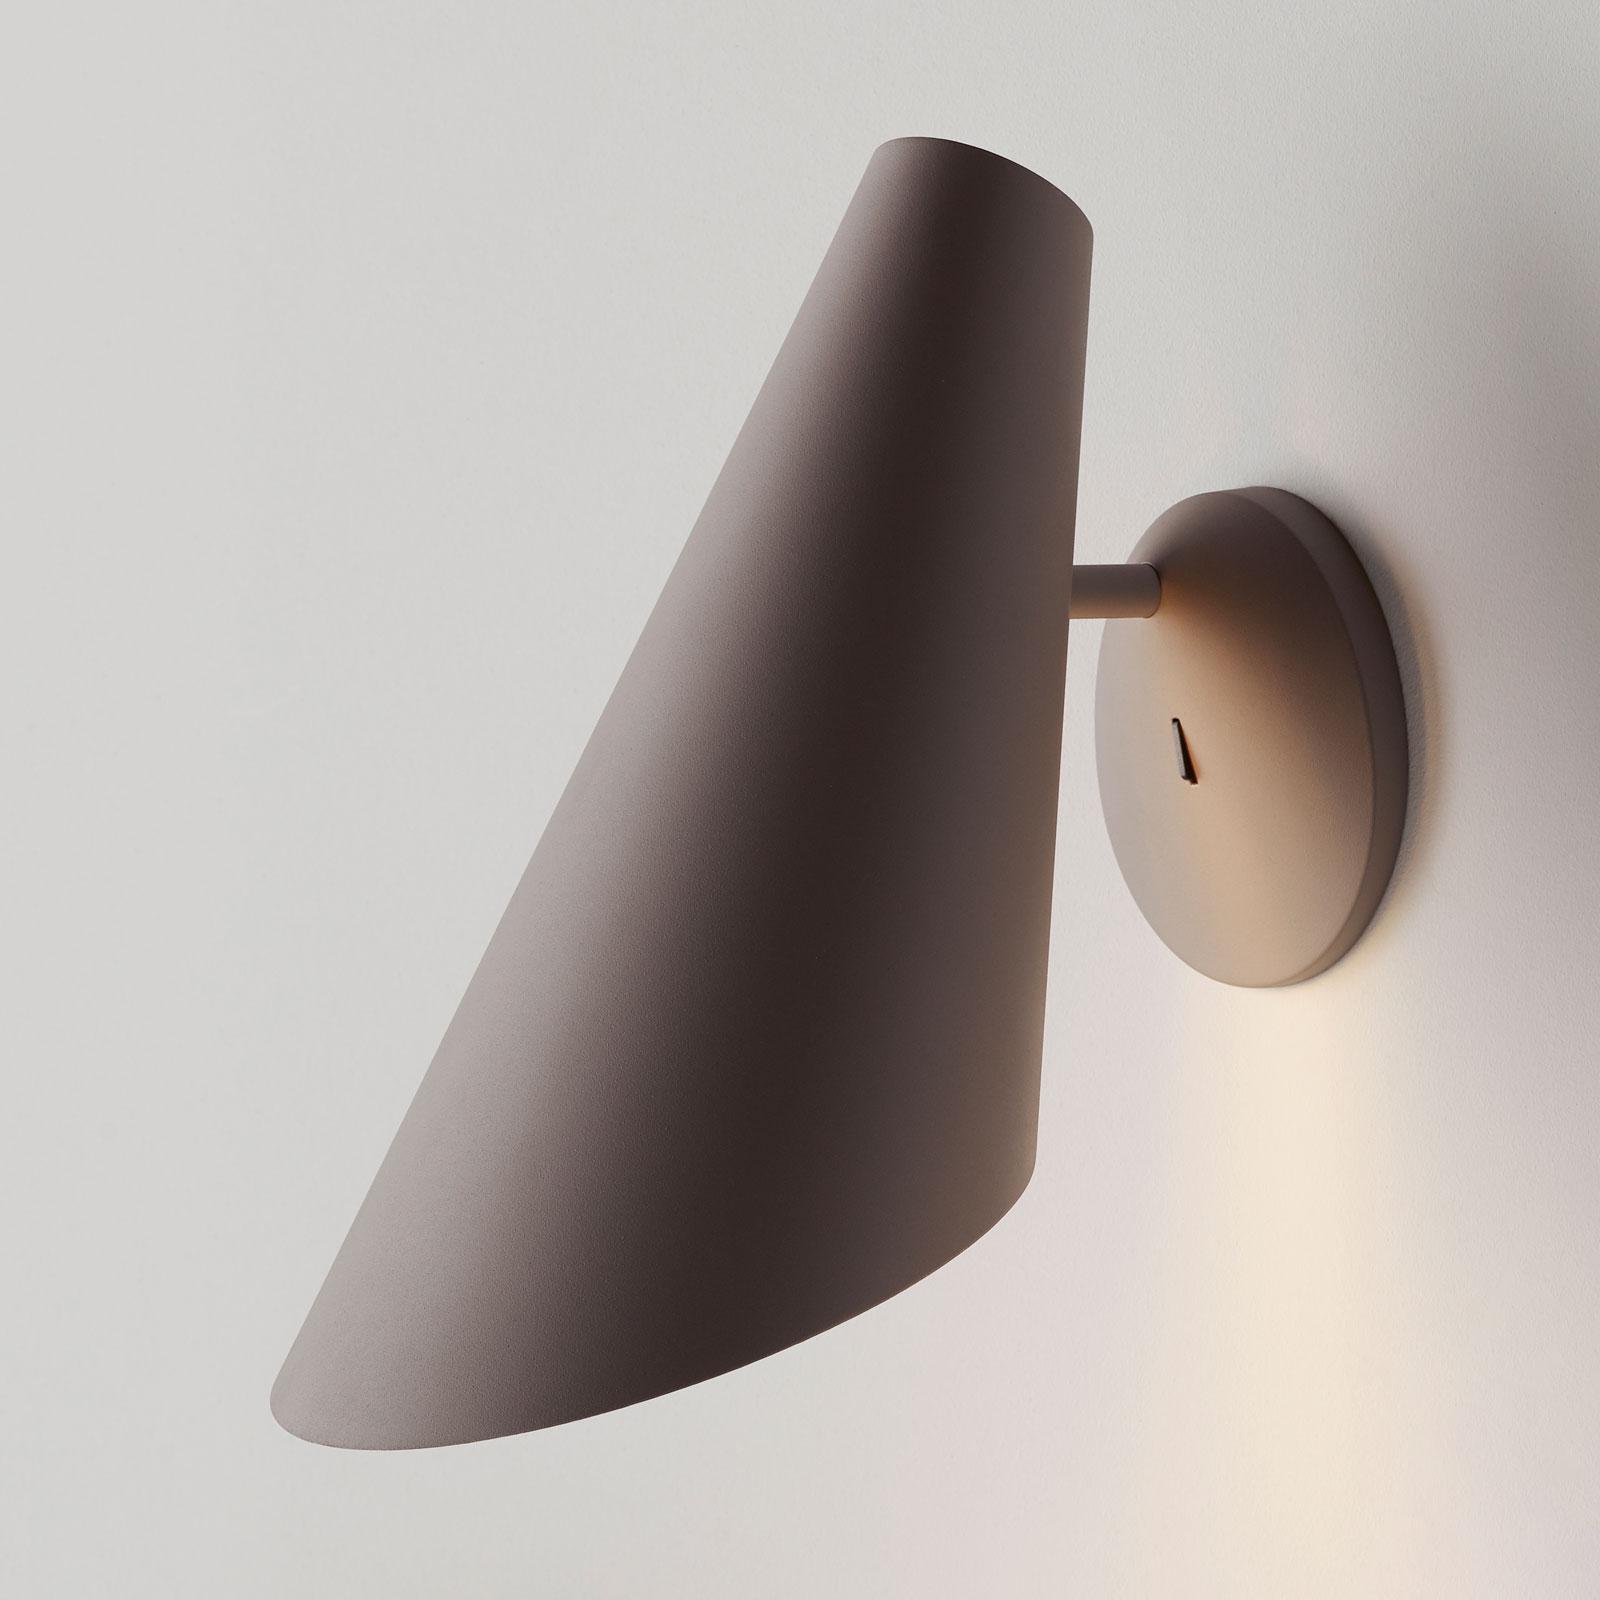 Vibia I.Cono 0720 wandlamp, 28 cm, beige